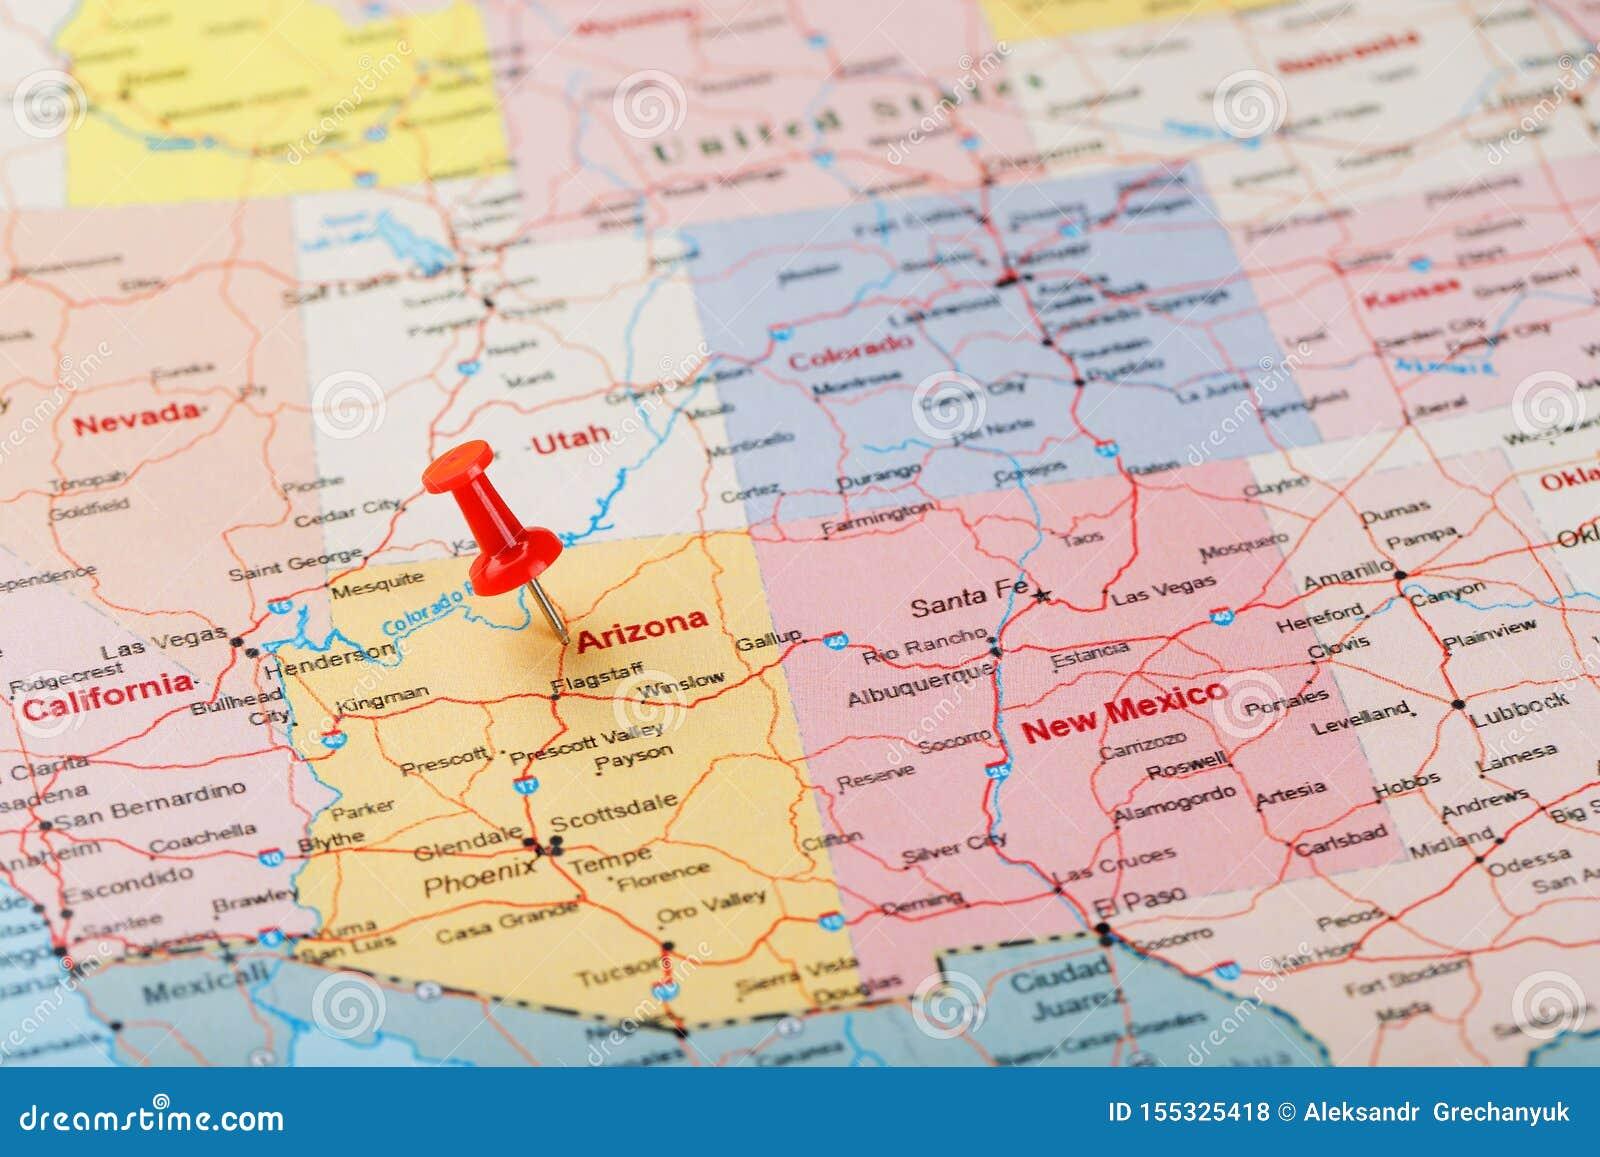 Red Clerical Needle On A Map Of USA, Arizona And The Capital ... on alaska usa, arizona surrounding states, arizona map mexico, arizona border map, arizona map red, arizona county map, arizona flag usa, arizona map yuma az, arizona teams, arizona map phoenix az, arizona map sedona az, arizona map coloring page, arizona map tempe az, arizona map with cities, arizona map with lakes, arizona map outline, arizona map clip art,